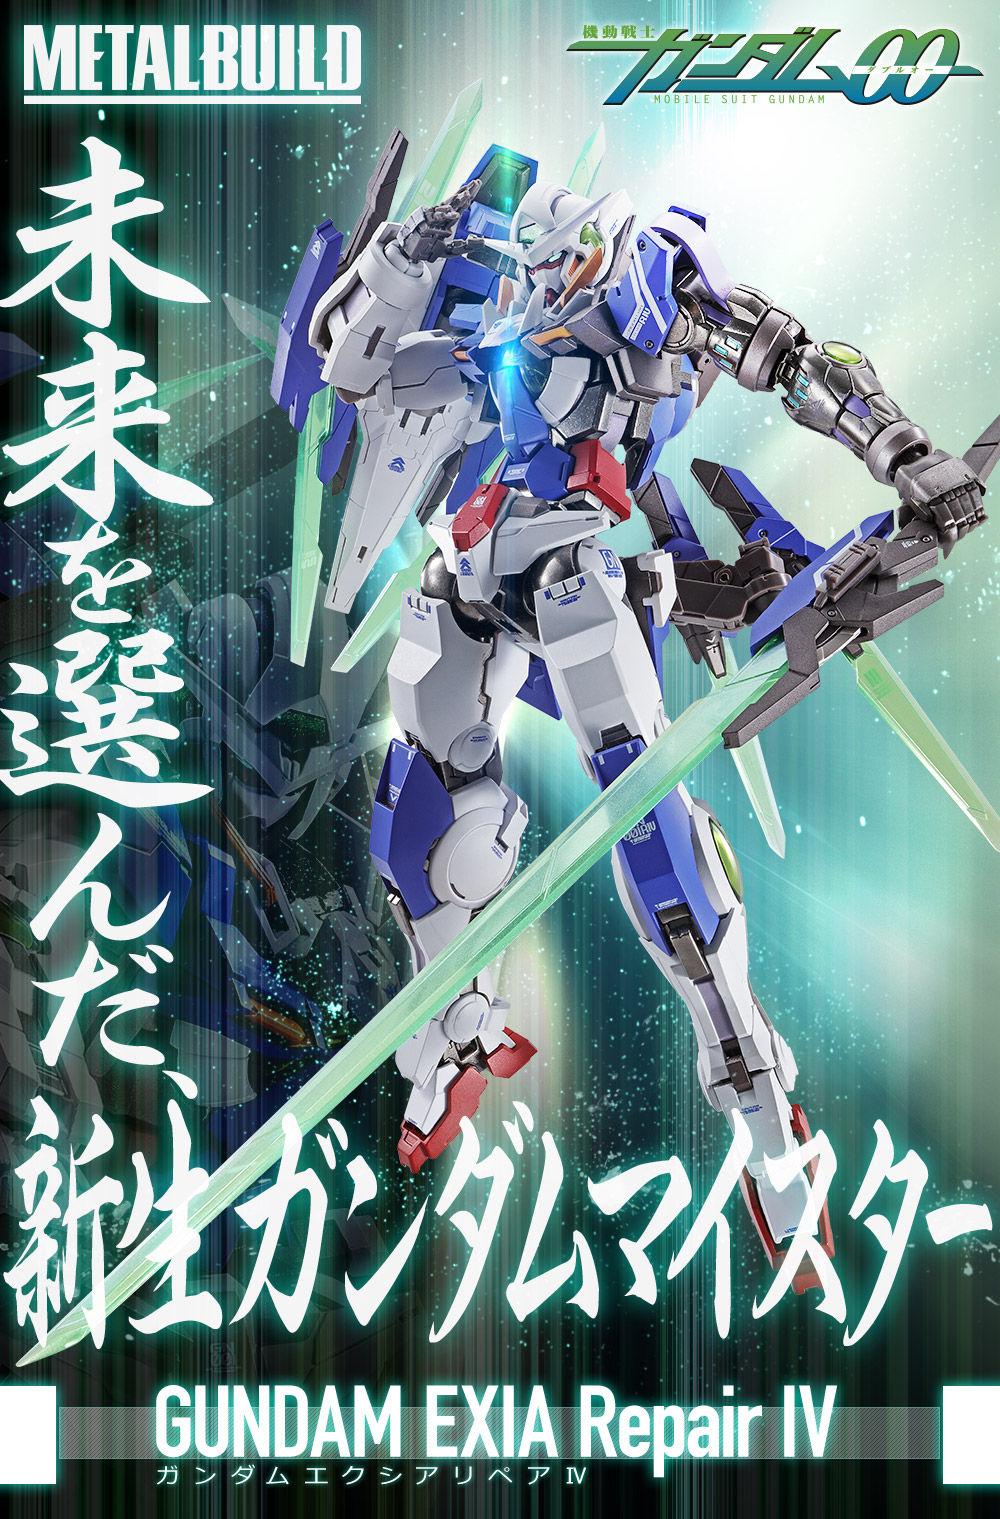 Gundam - Page 91 Dtl_mb10